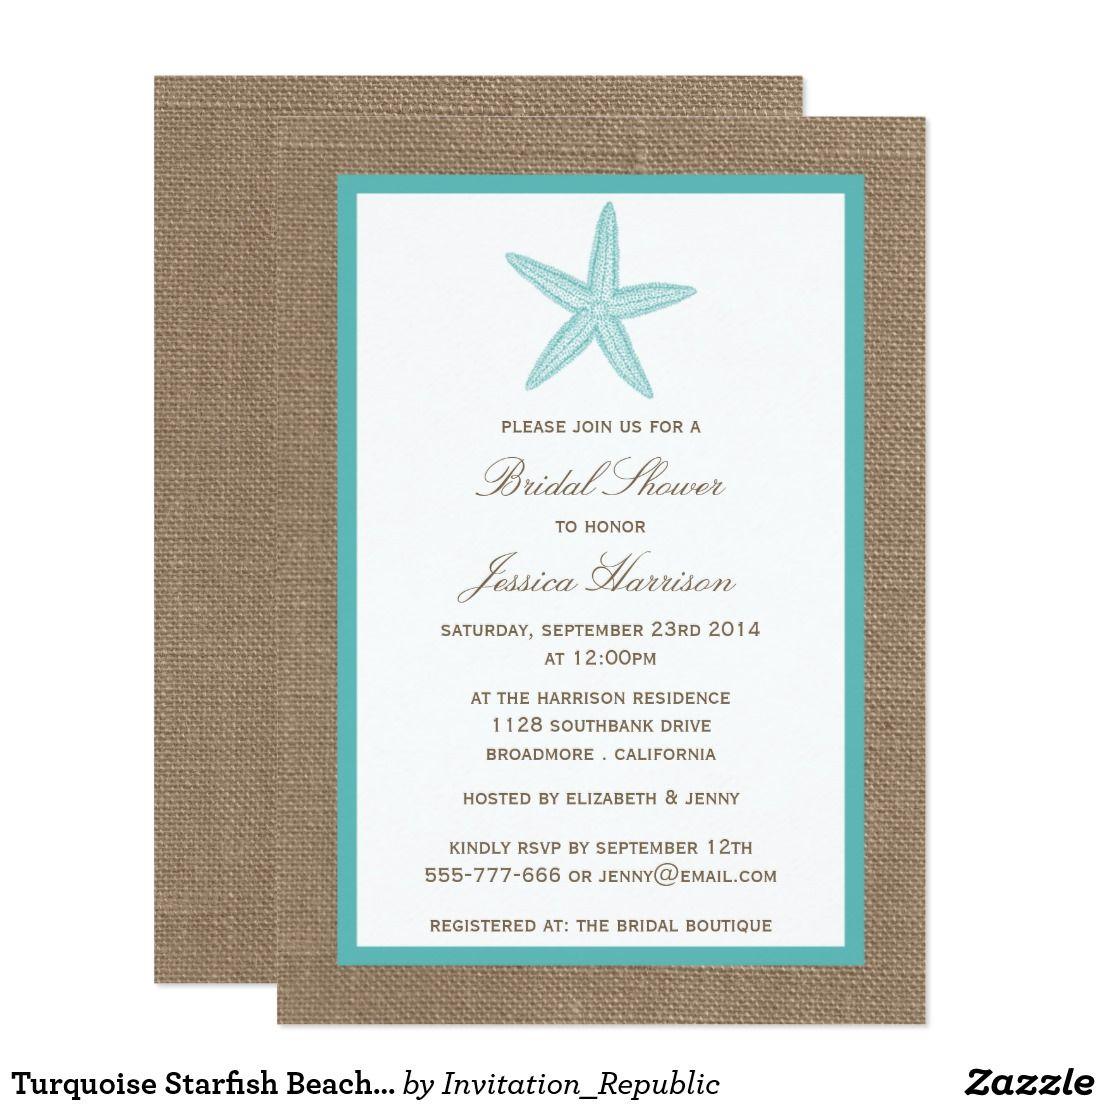 Bridal Shower Etiquette Invite